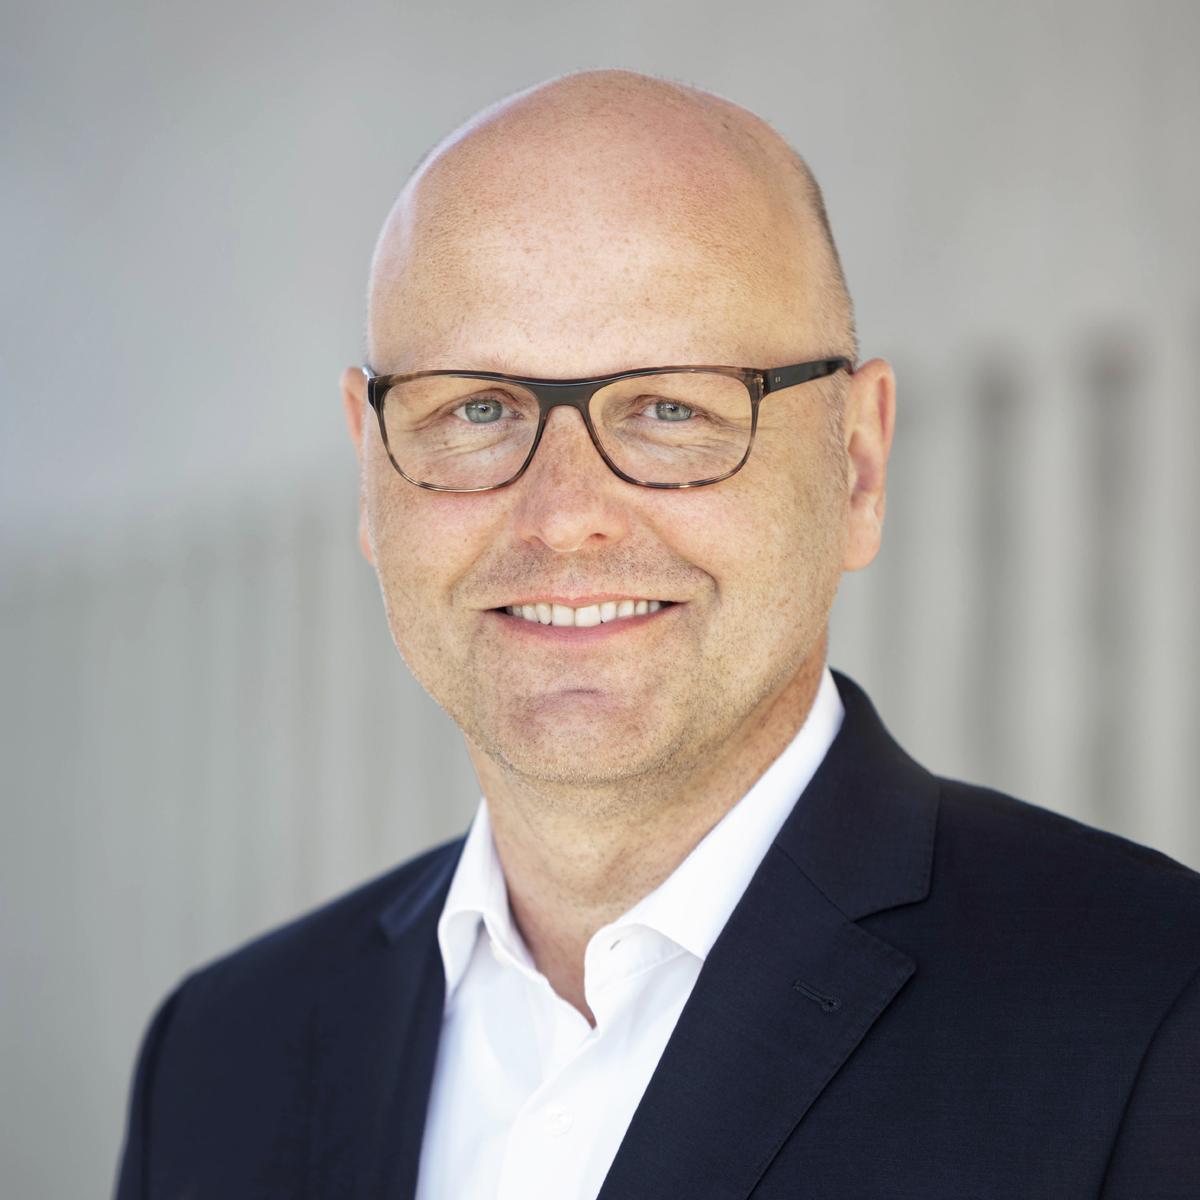 Frank Gieth Business Coaching, Training und Beratung